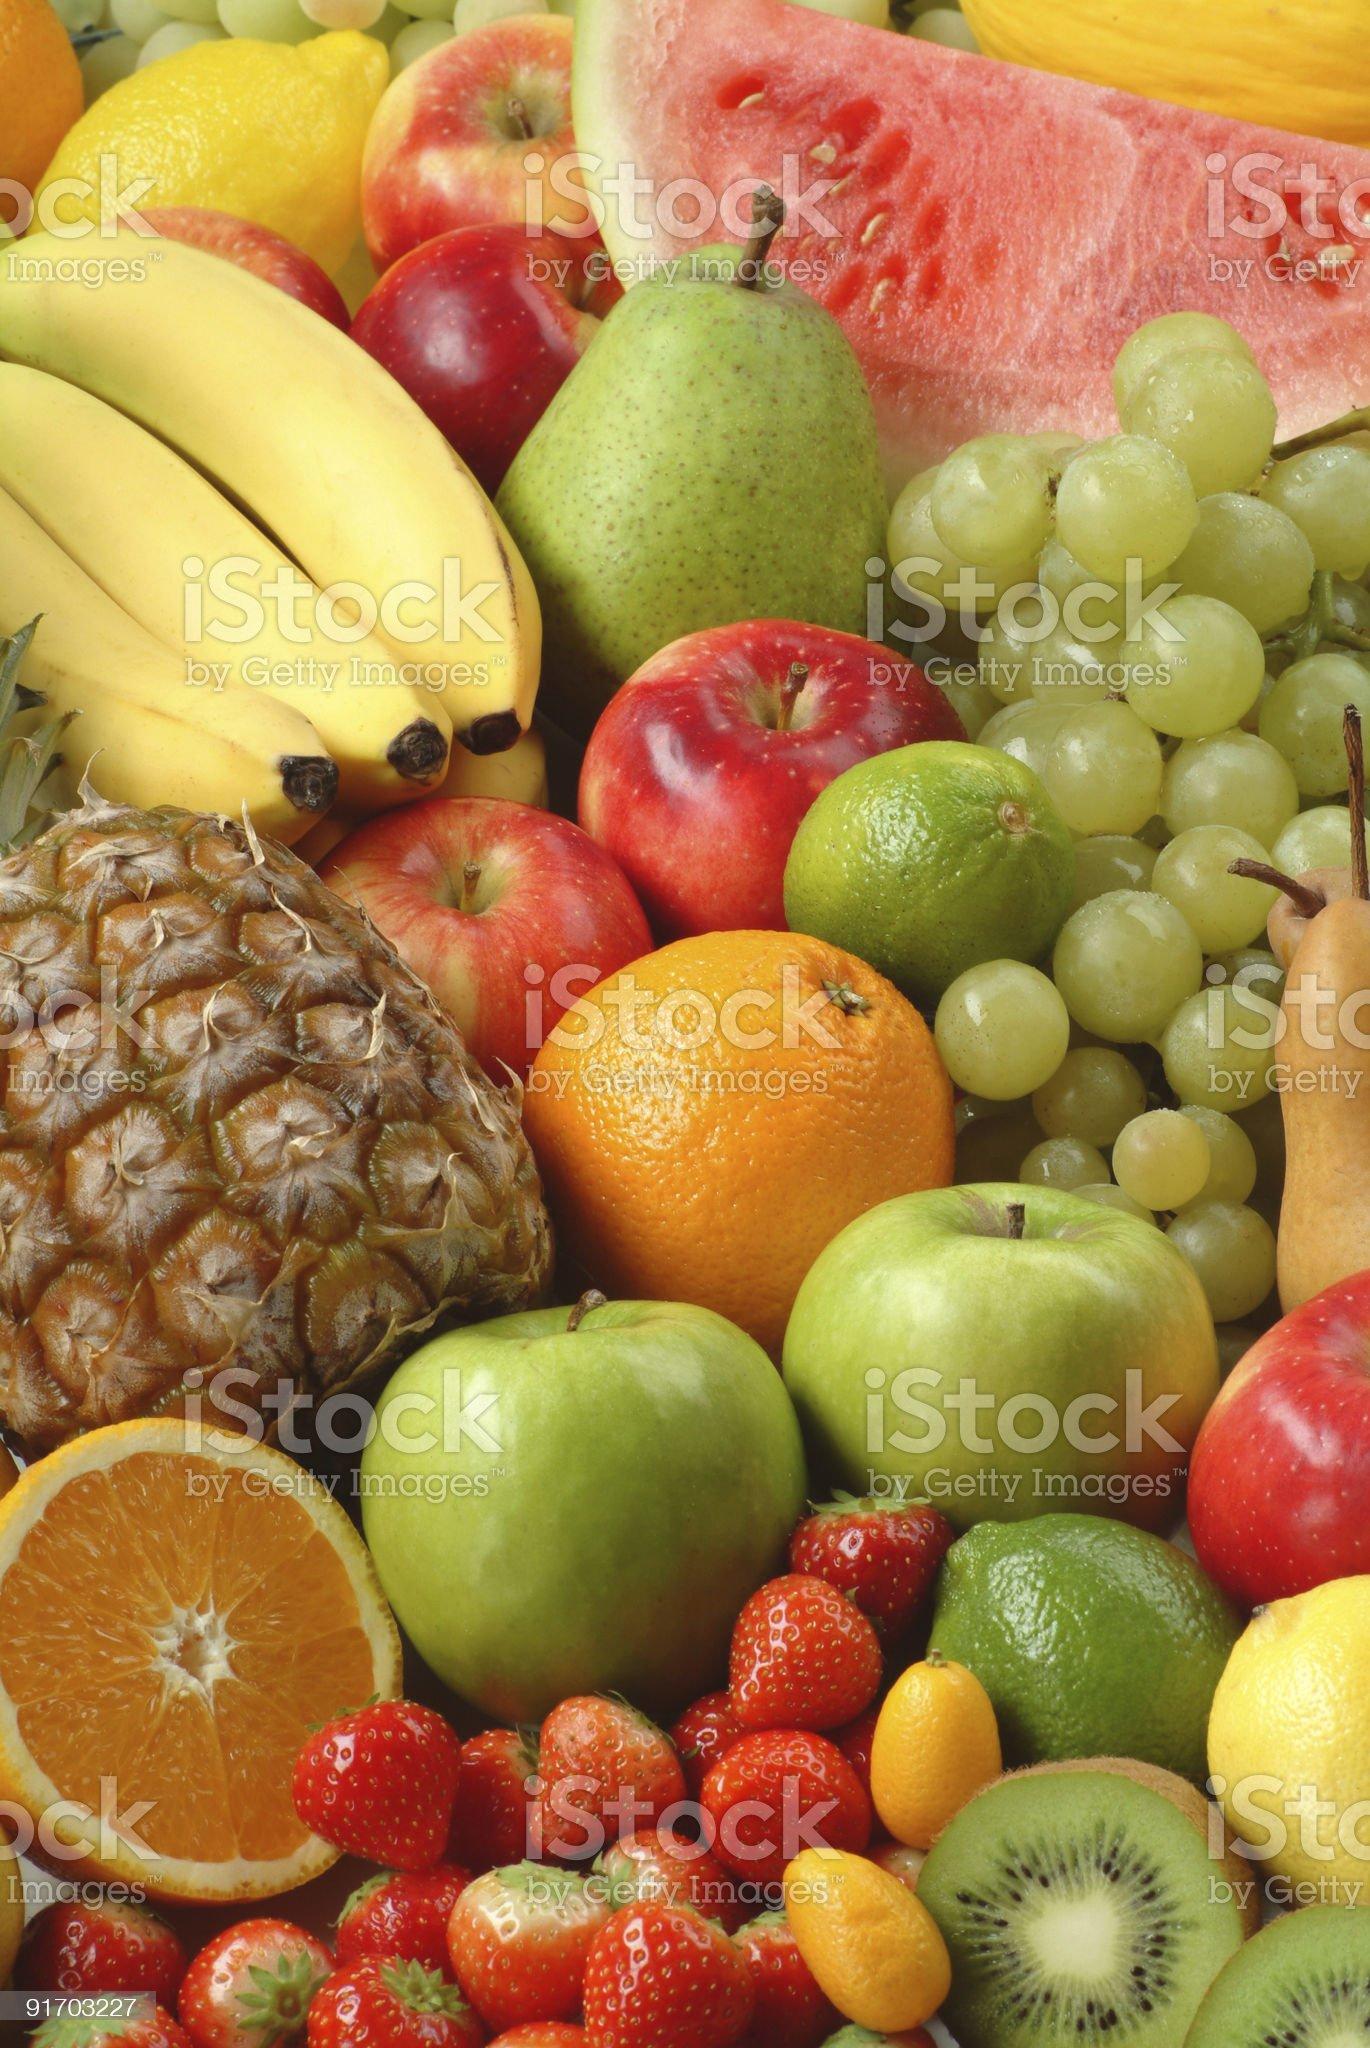 Assortment of fresh fruit royalty-free stock photo